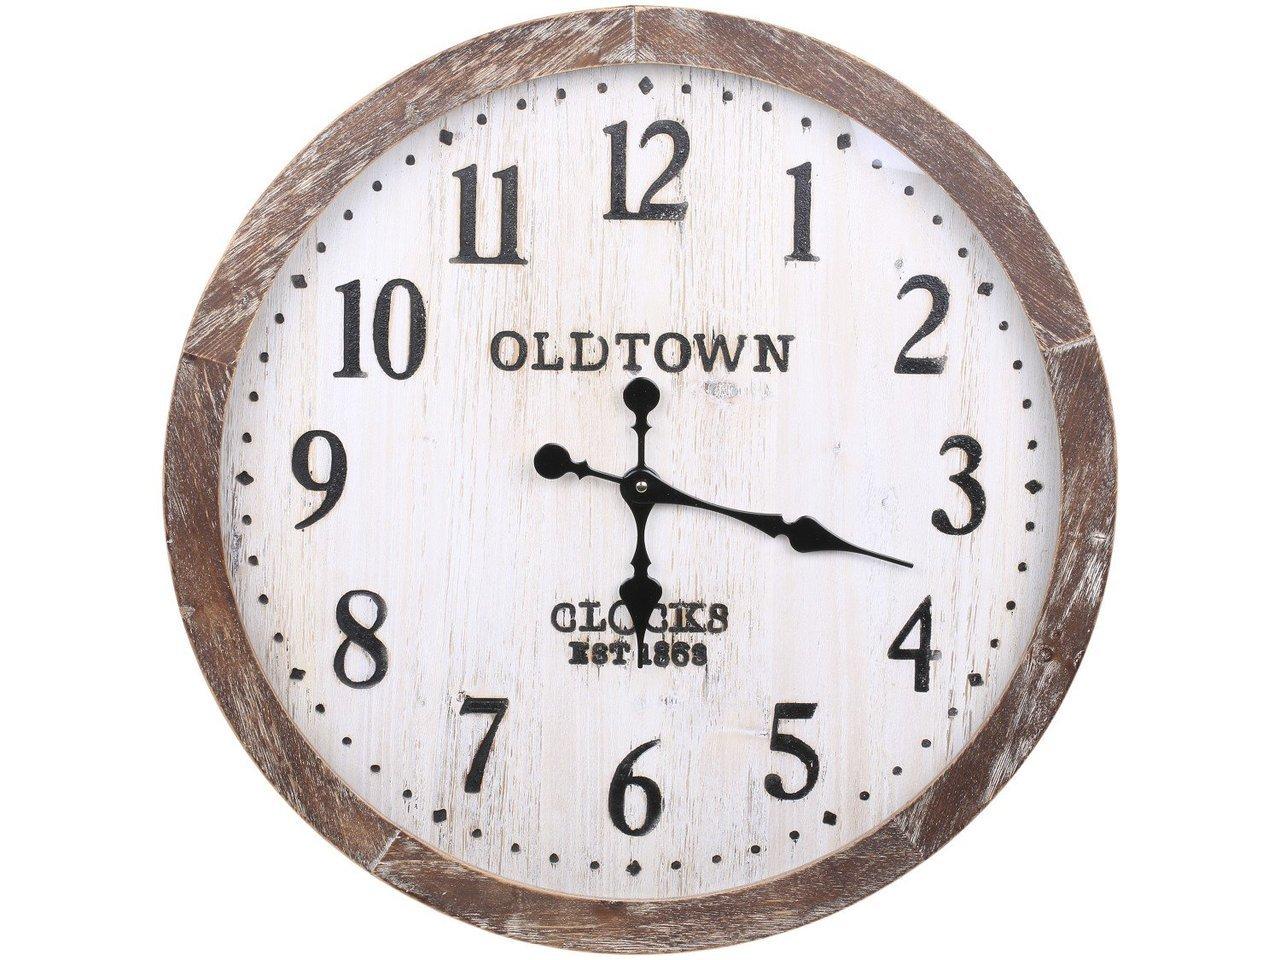 Chic Antique Wanduhr Oldtown